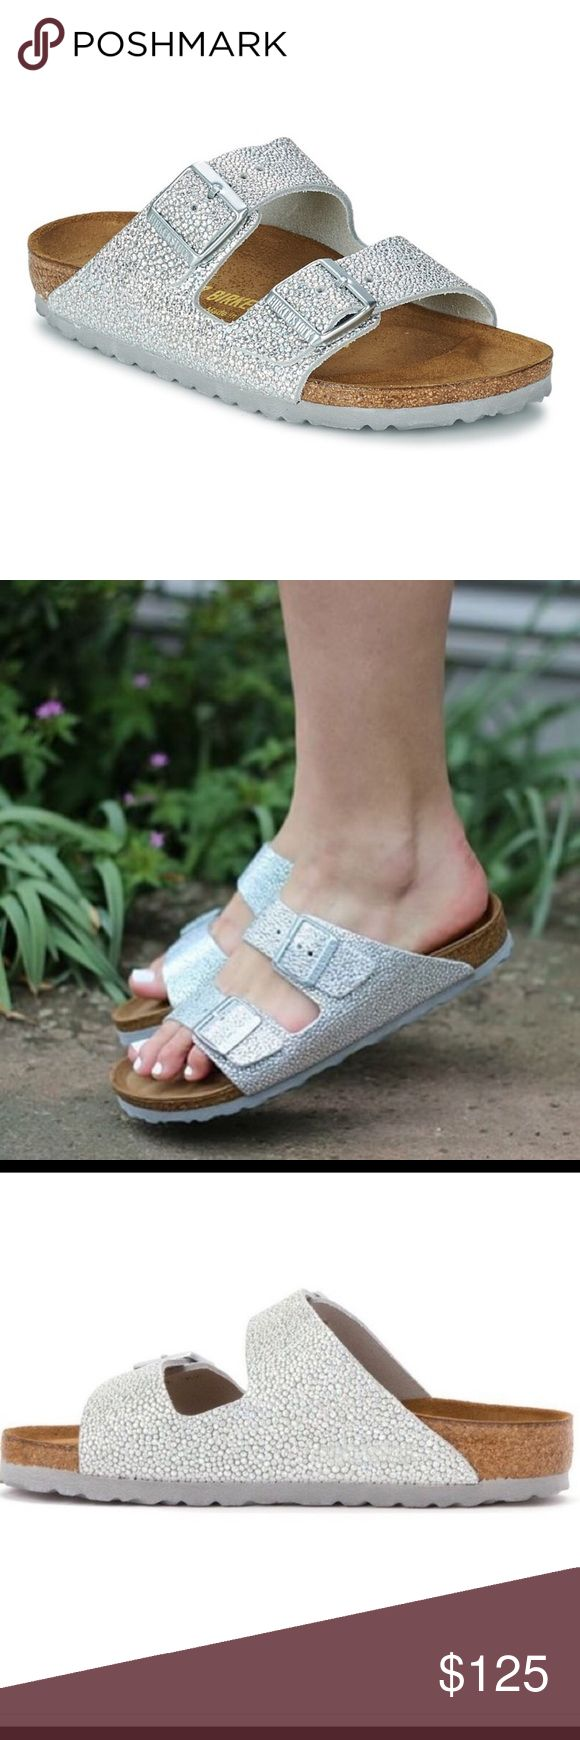 Birkenstock Arizona Silver Pebbled Leather 38 Love these. Birkenstock Shoes Sandals